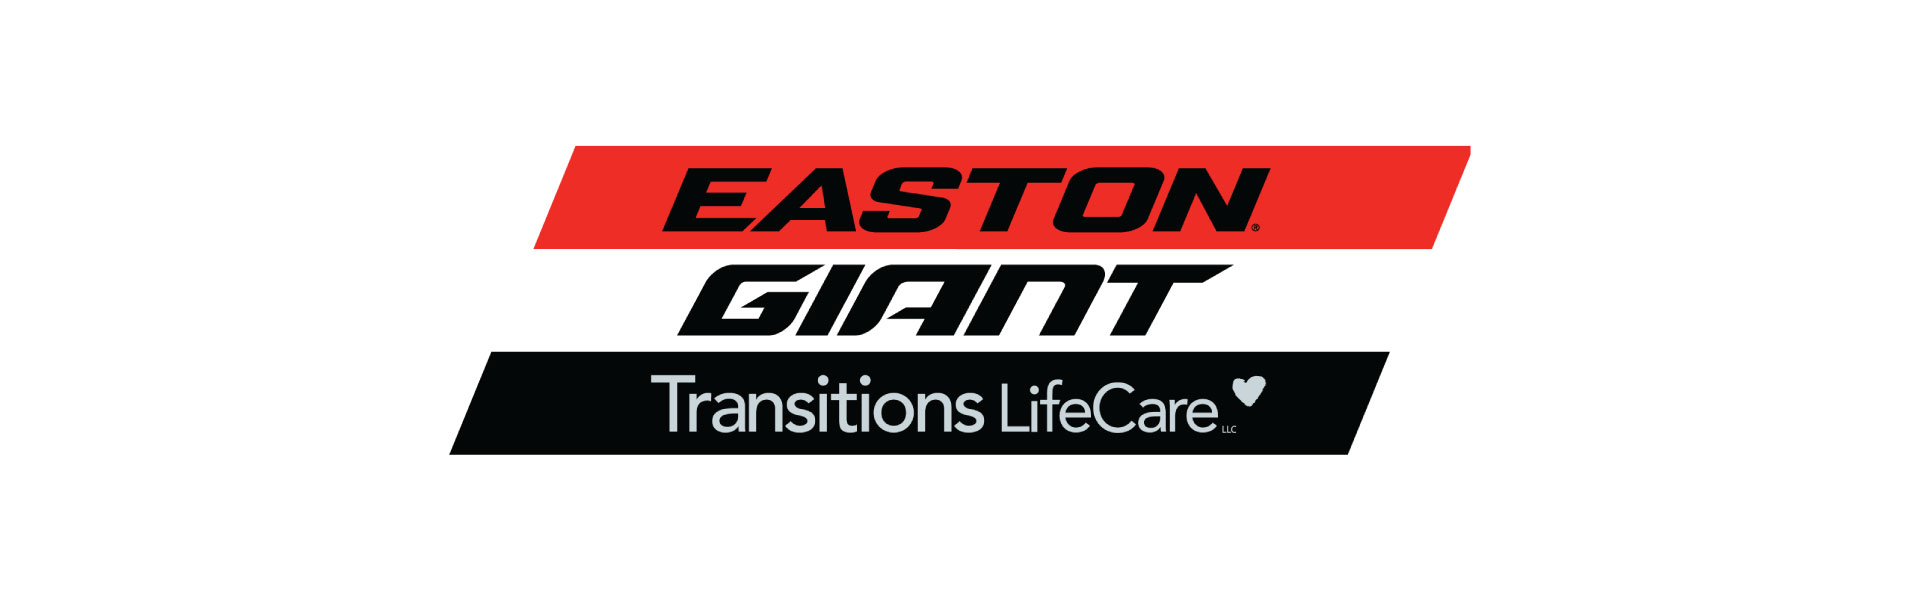 Easton-Giant Cyclocross Team